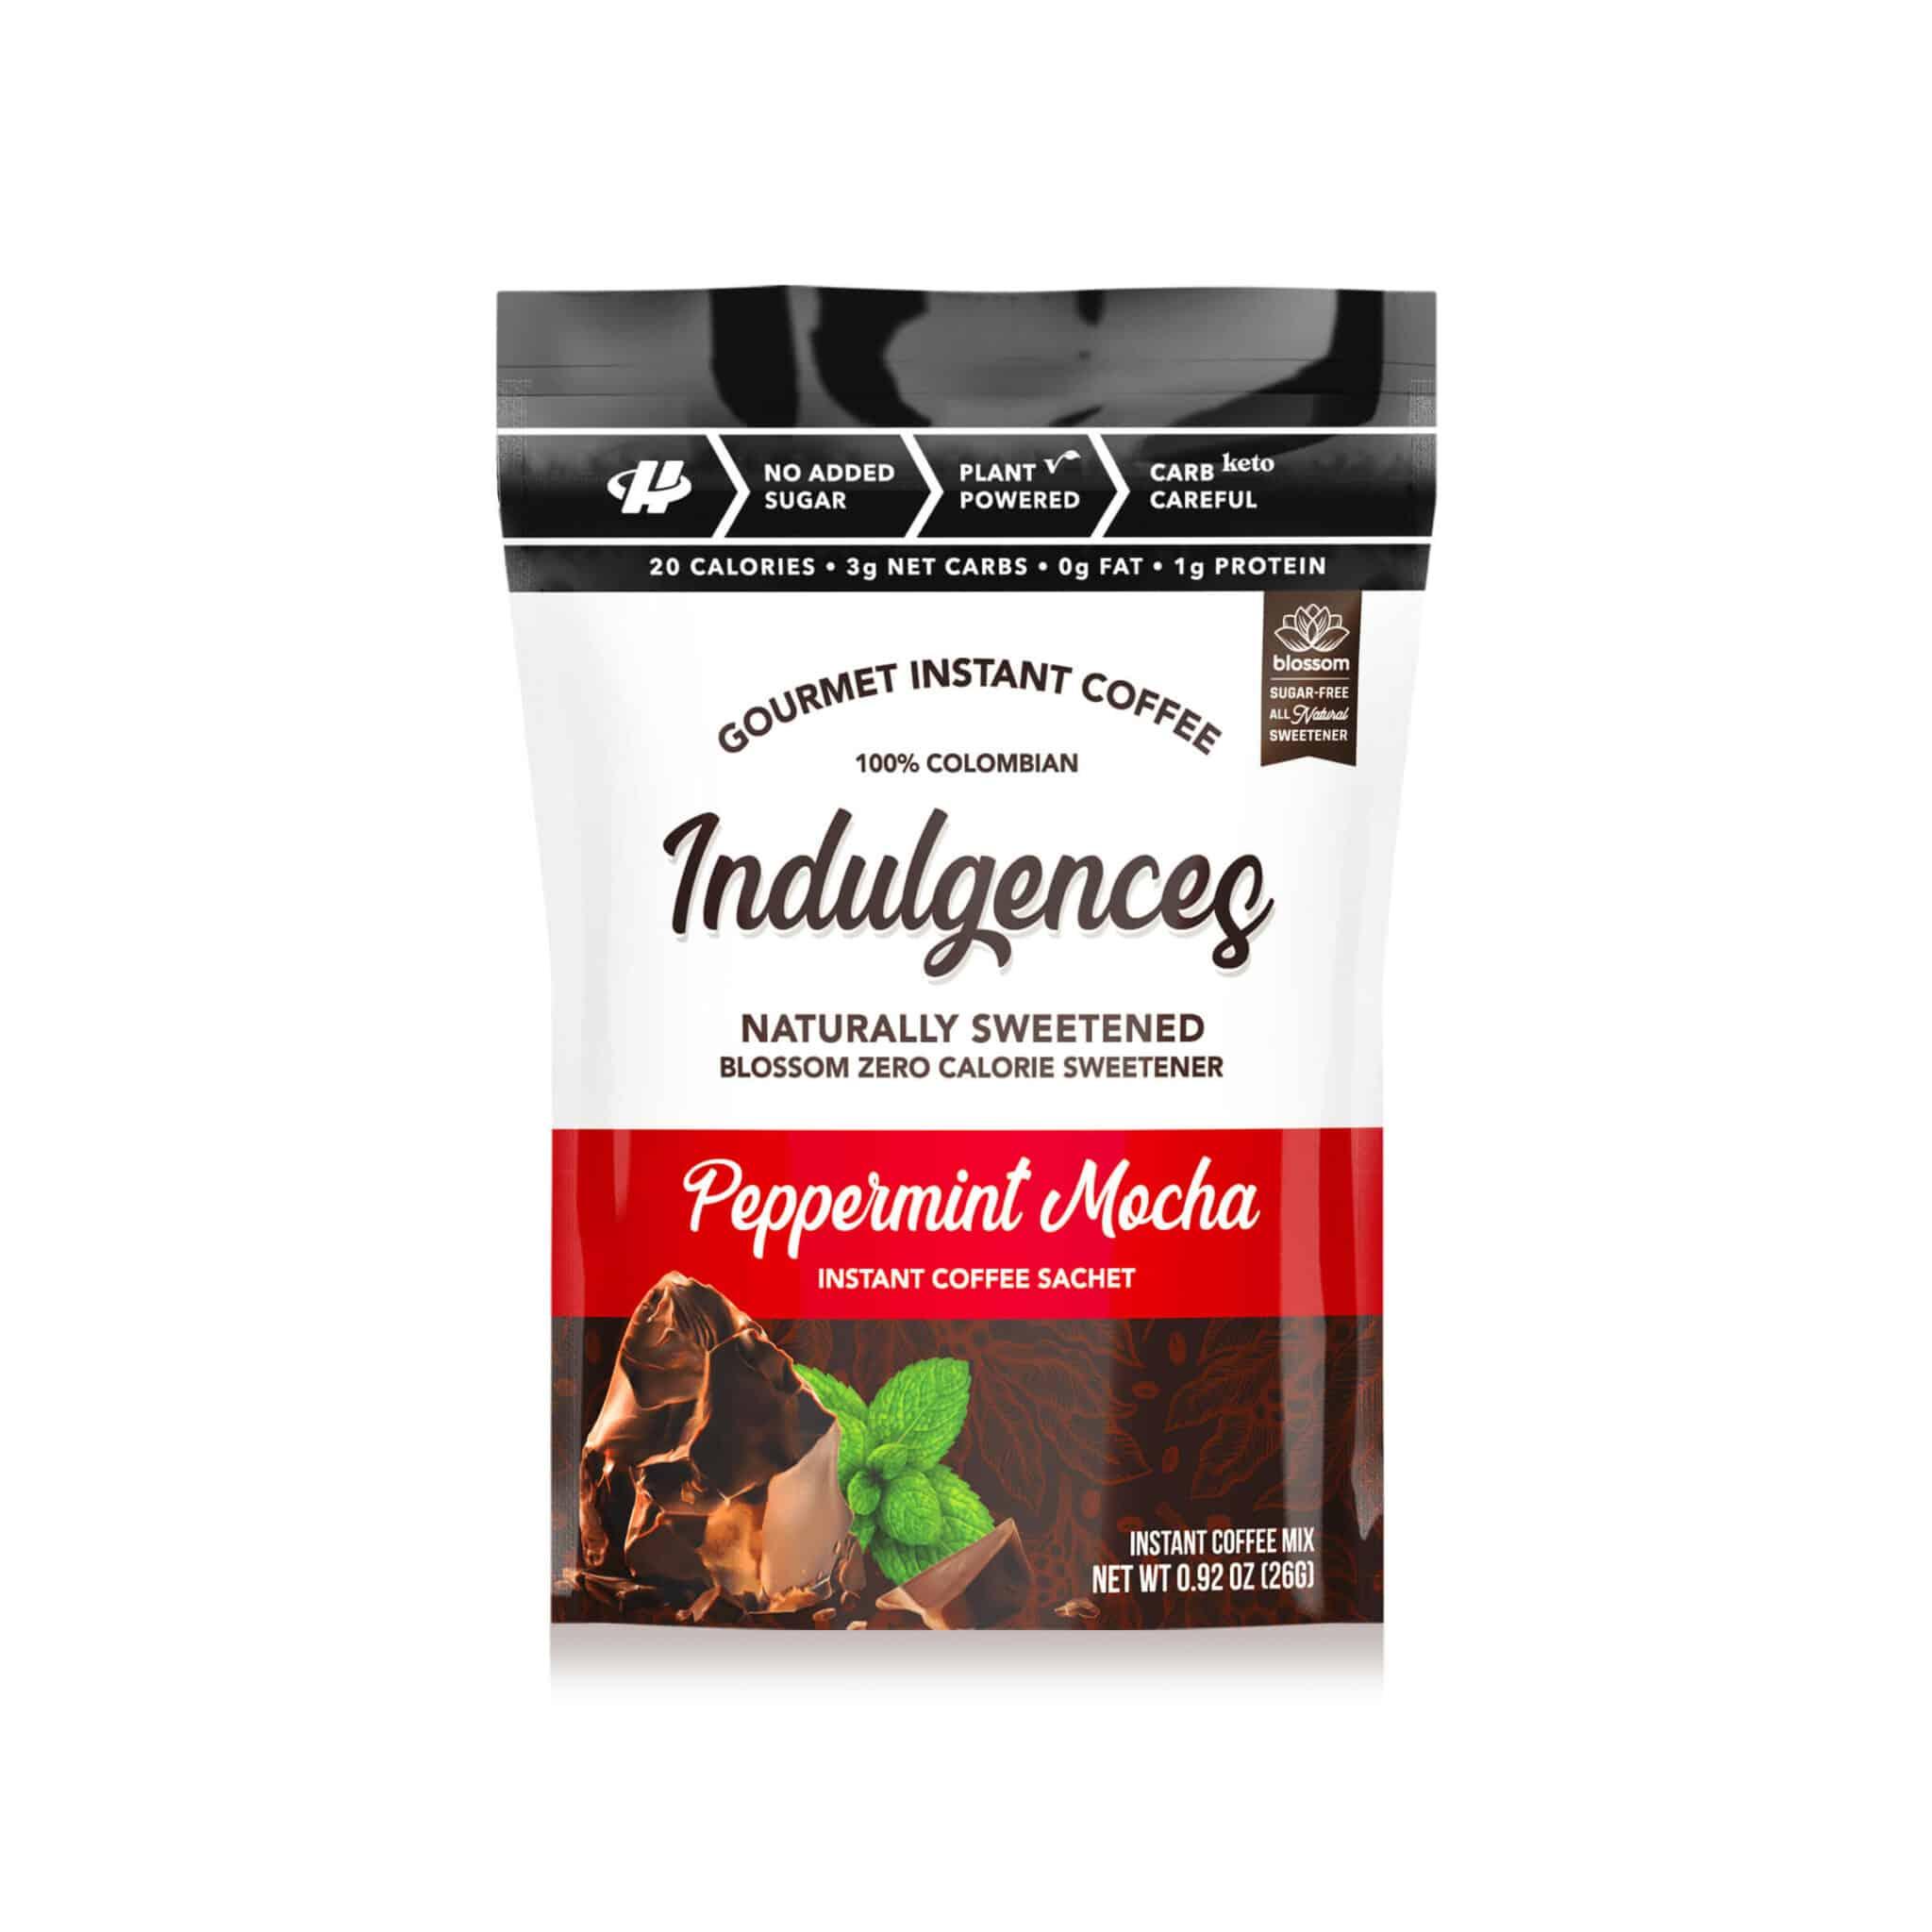 Indulgences Peppermint Mocha Keto Coffee